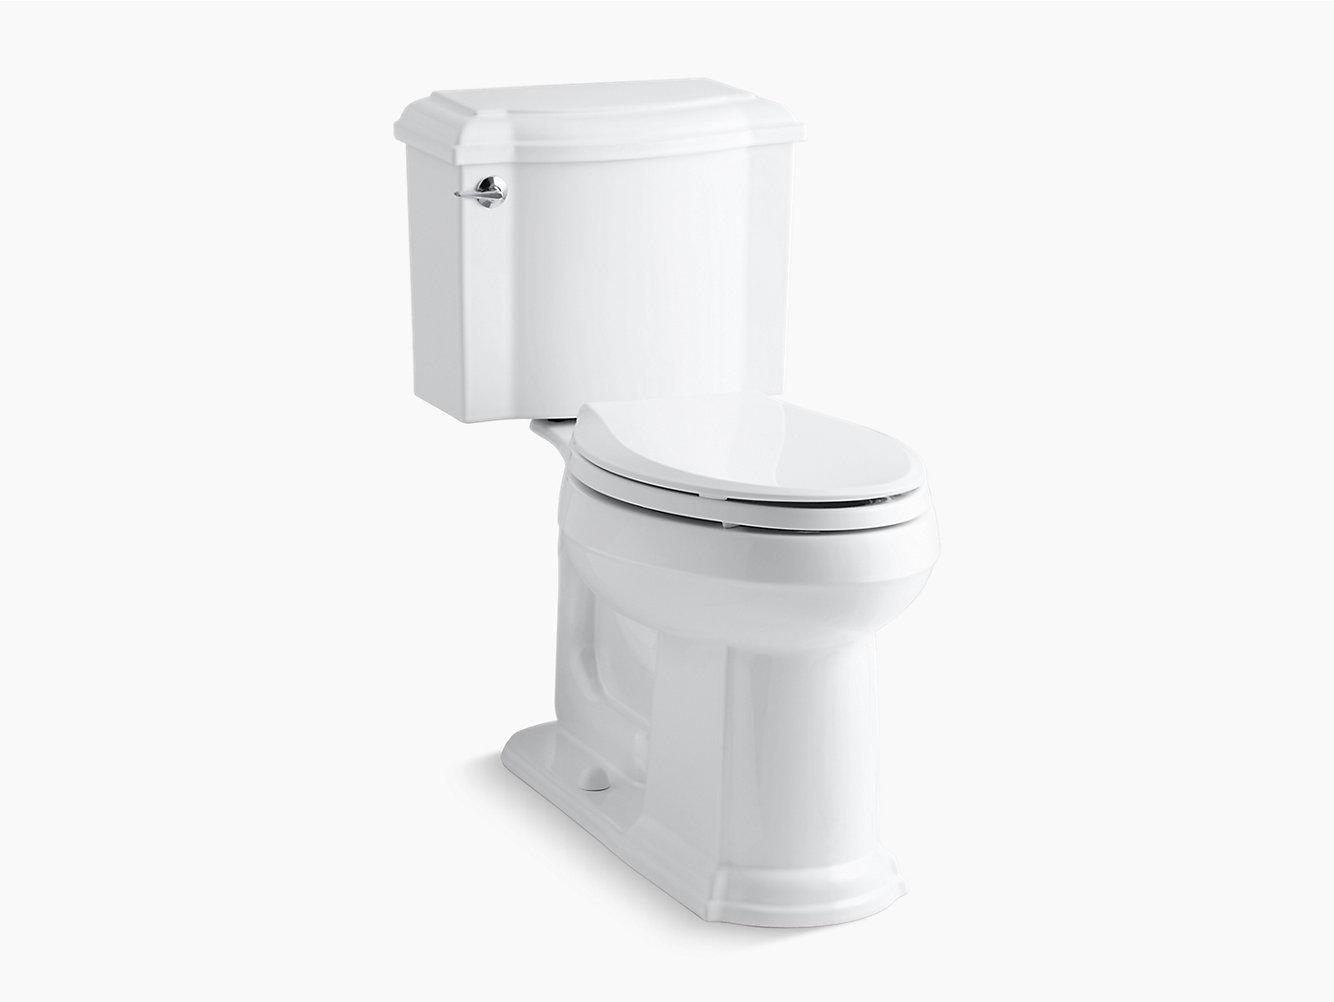 Kohlerk 3837devonshire two piece elongated 128 gpf toilet kohler view larger pooptronica Image collections